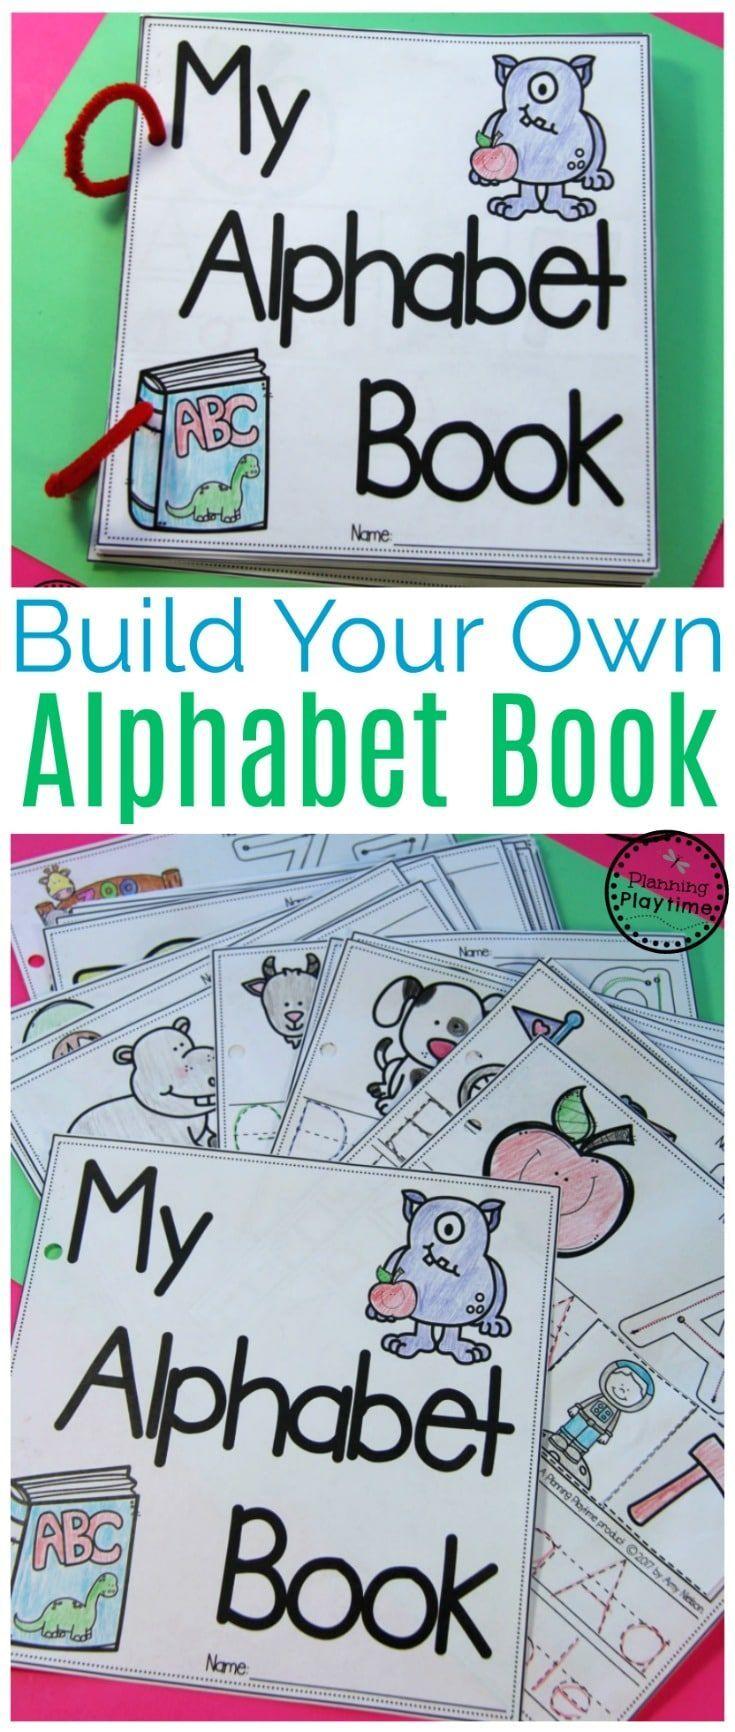 Diy Alphabet Books Planning Playtime Alphabet Book Preschool Alphabet Book Alphabet Preschool [ 1732 x 735 Pixel ]